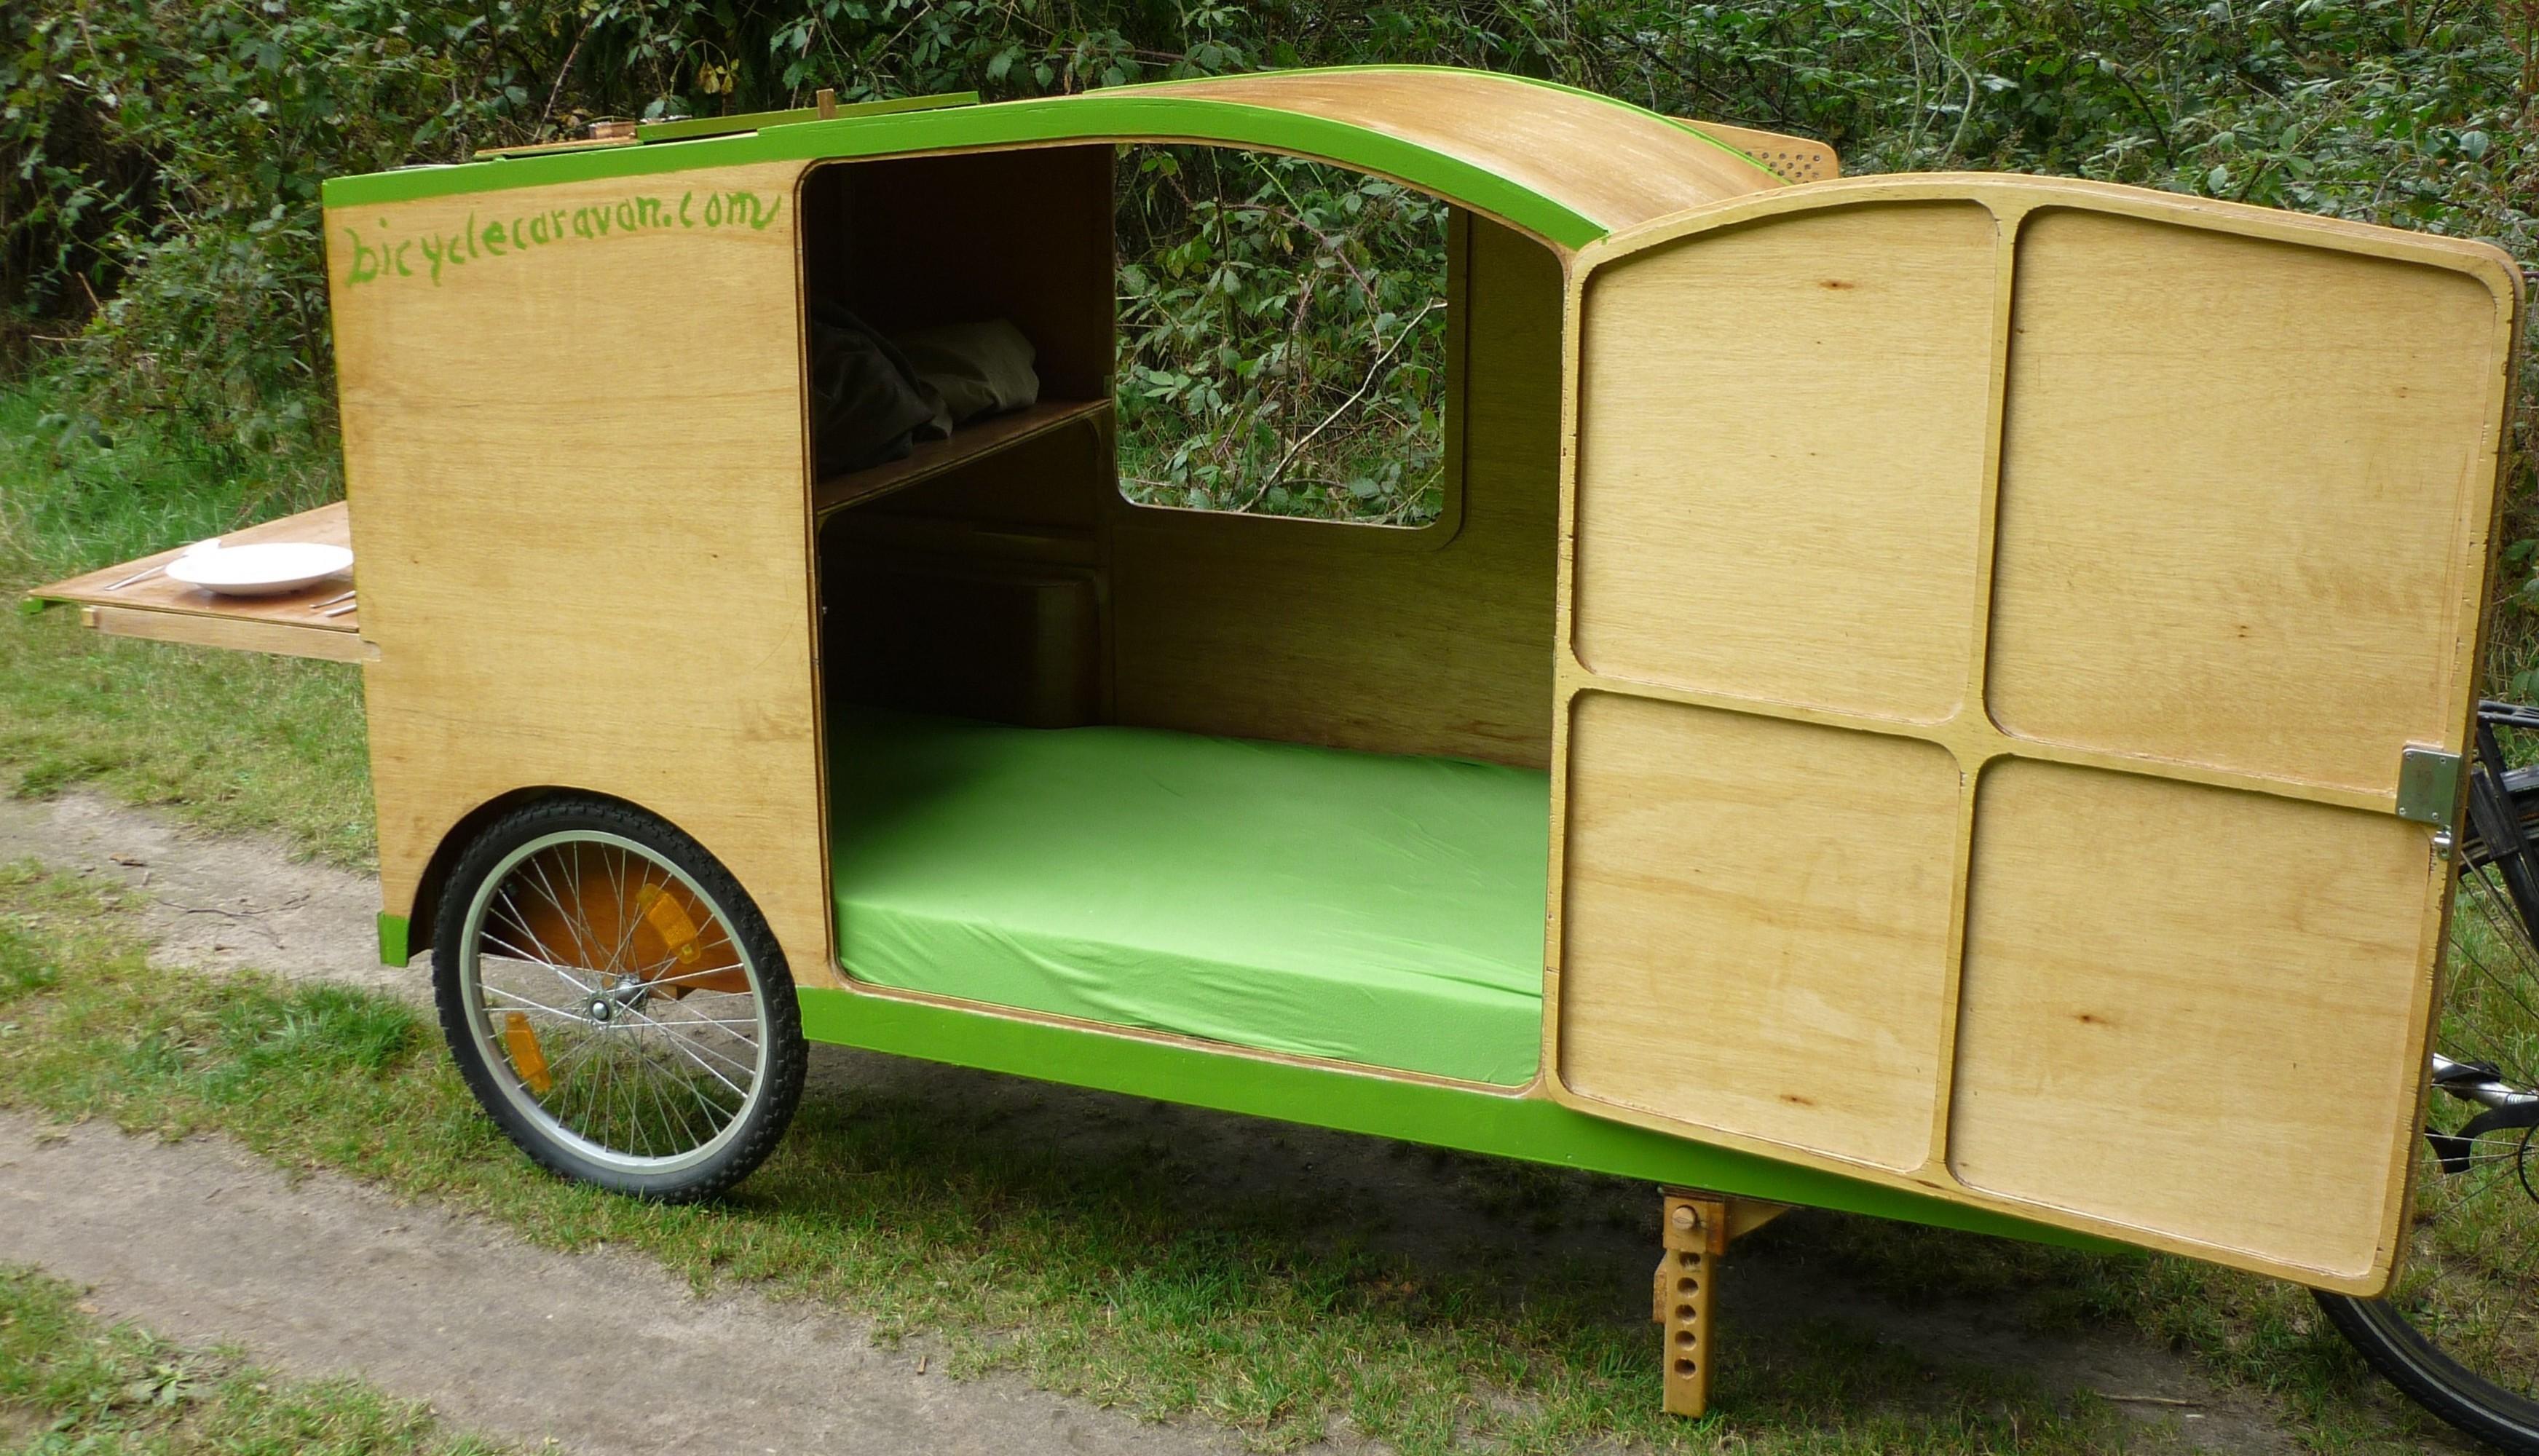 bicycle caravan fietscaravan fahrradwohnwagen bicycle. Black Bedroom Furniture Sets. Home Design Ideas